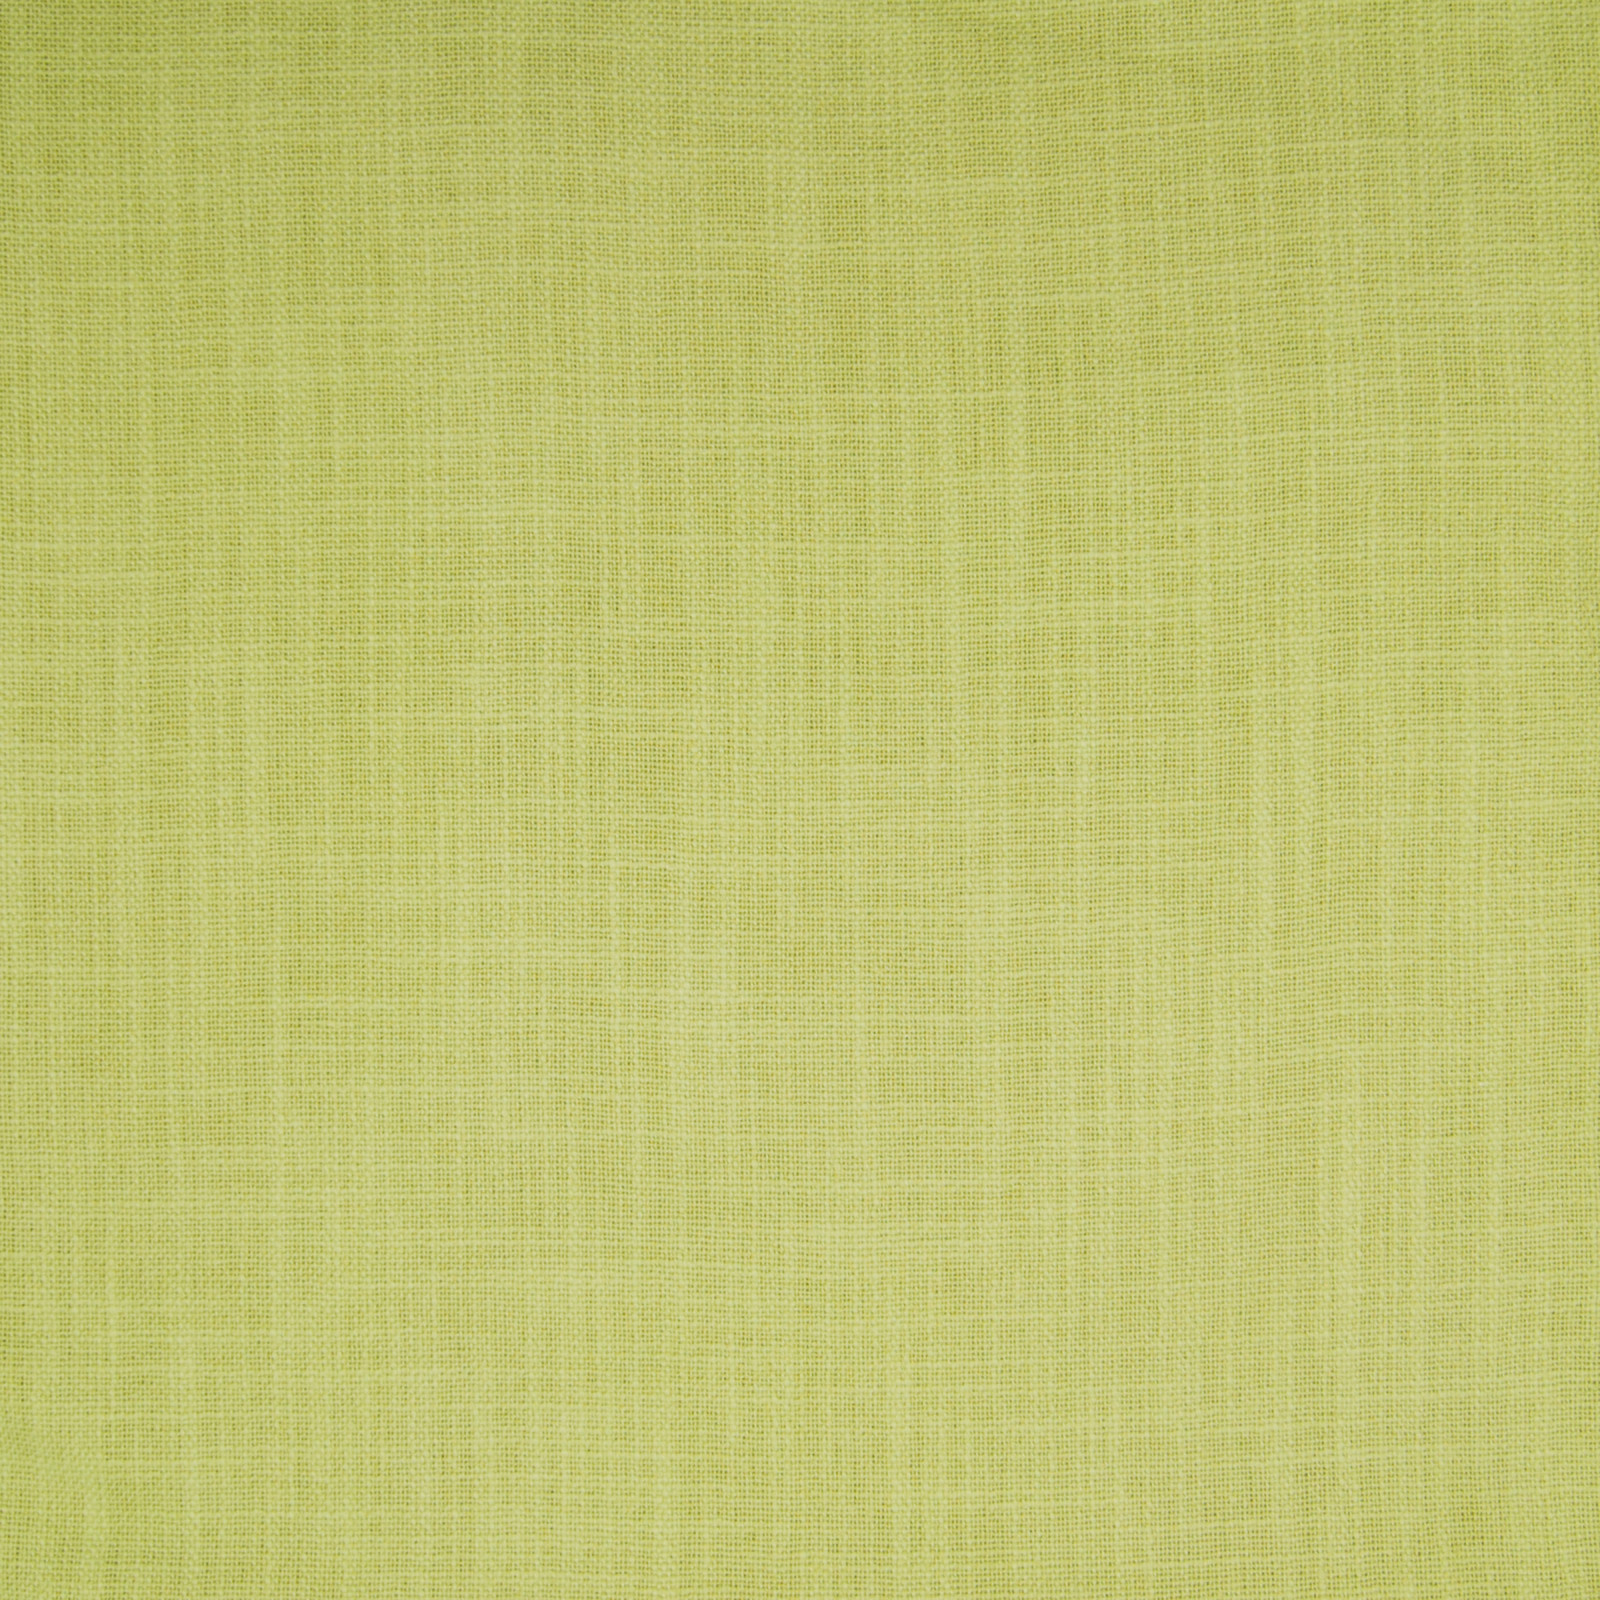 B3575 Parrot Greenhouse Fabrics